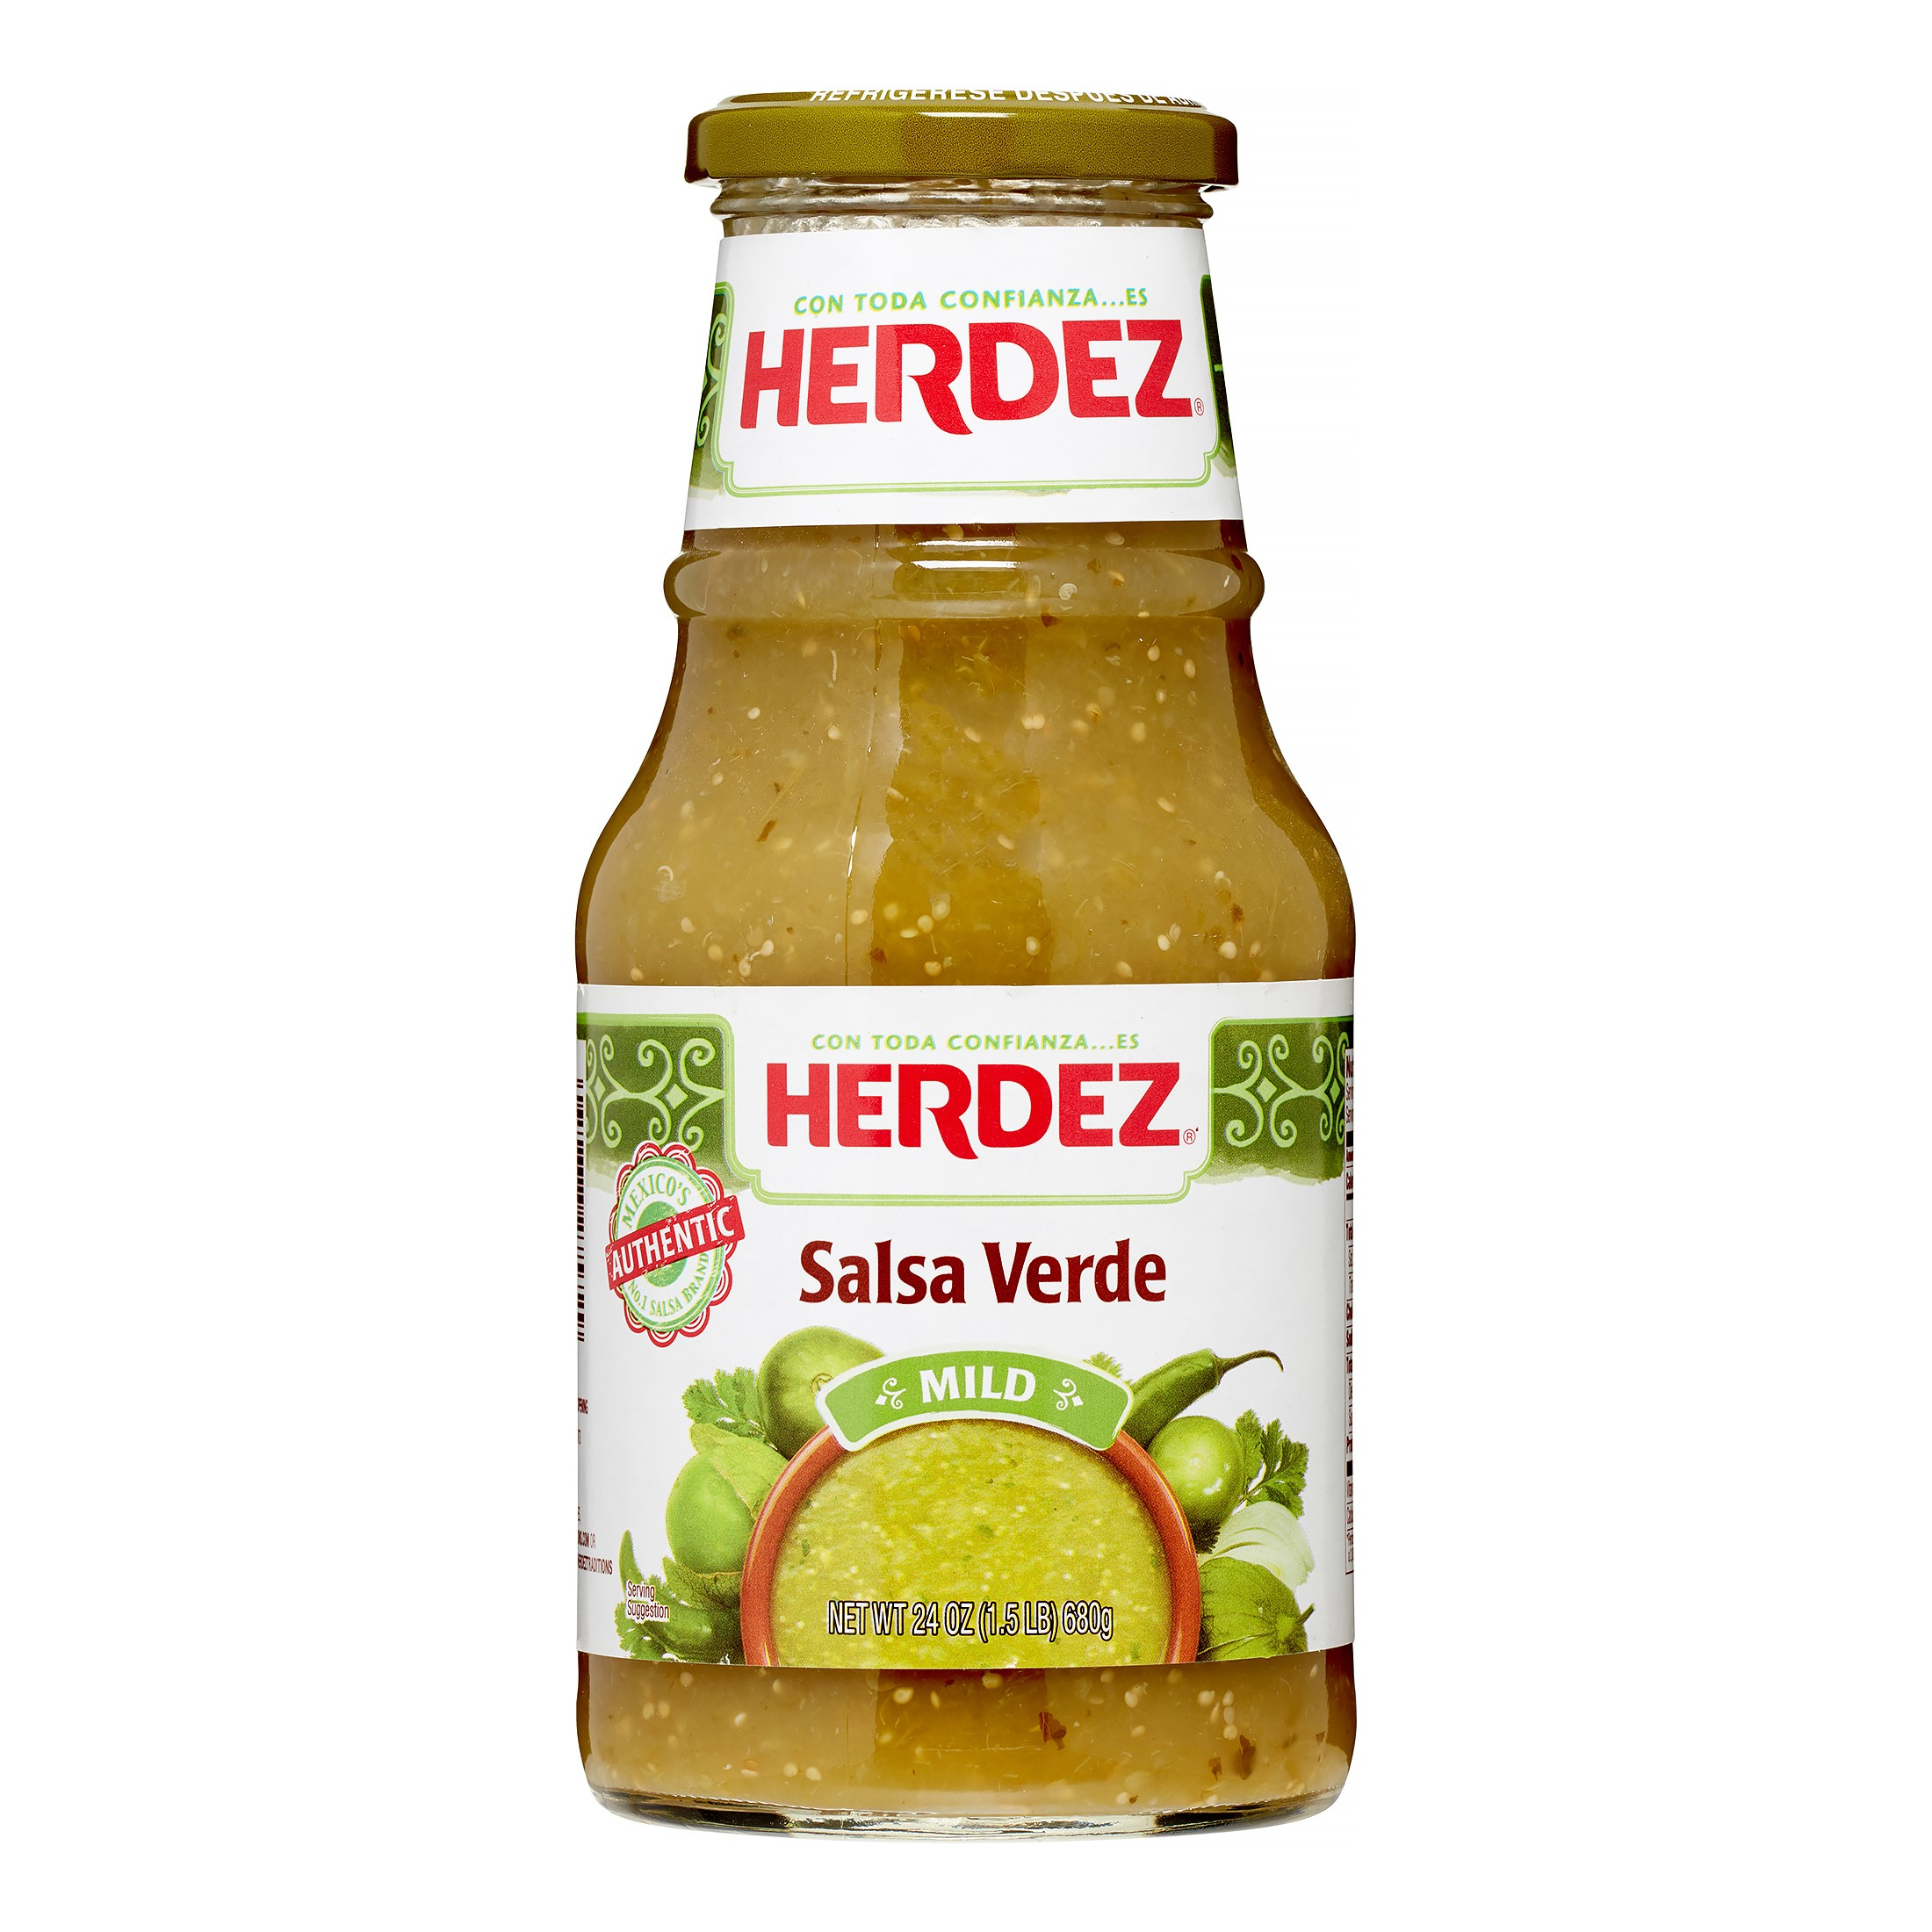 (2 Pack) Herdez Salsa, Verde, 24 Oz